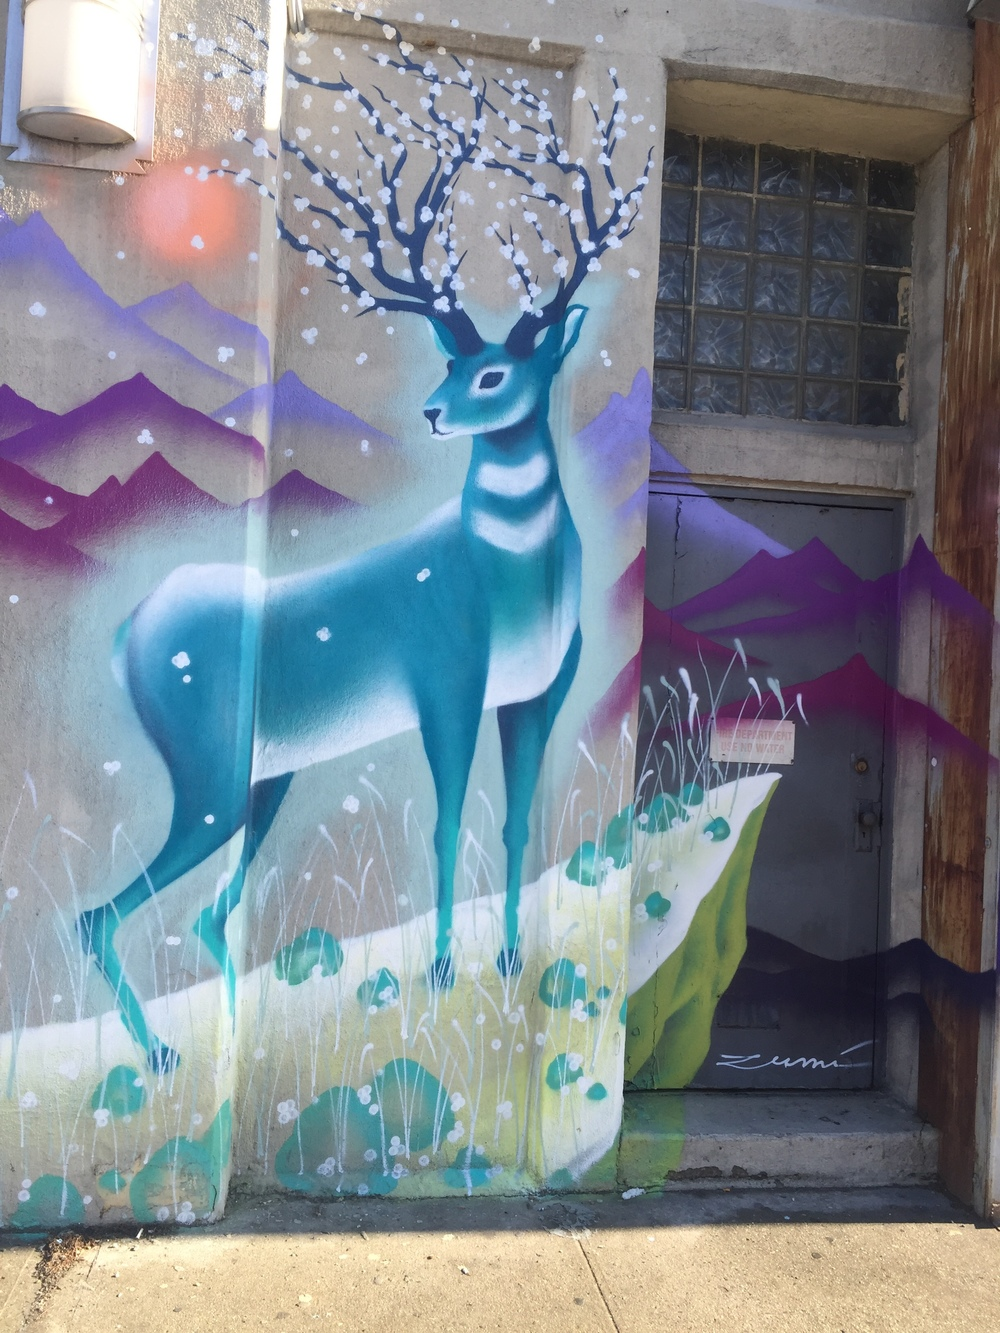 LIC street art by Marina Zumi.